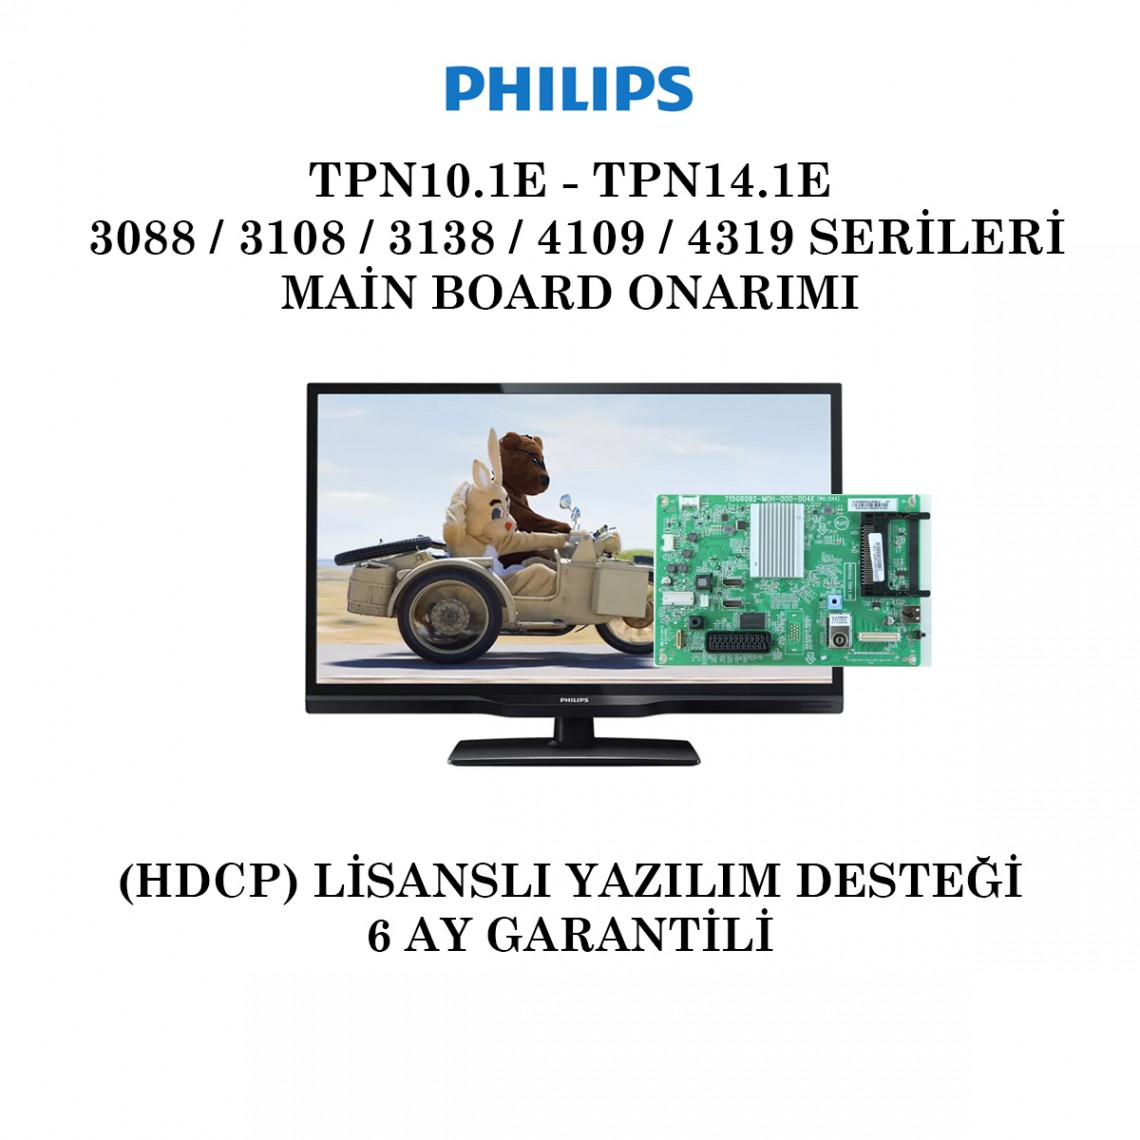 PHILIPS, TPN14.1E, TPN10.1E, 715G6092, 715G6092-M0D-000-004K, 715G6092-M0D-000-004N, 715G6092-M0G-000-004K, 715G6092-M01-000-004K, Main Board Onarımı